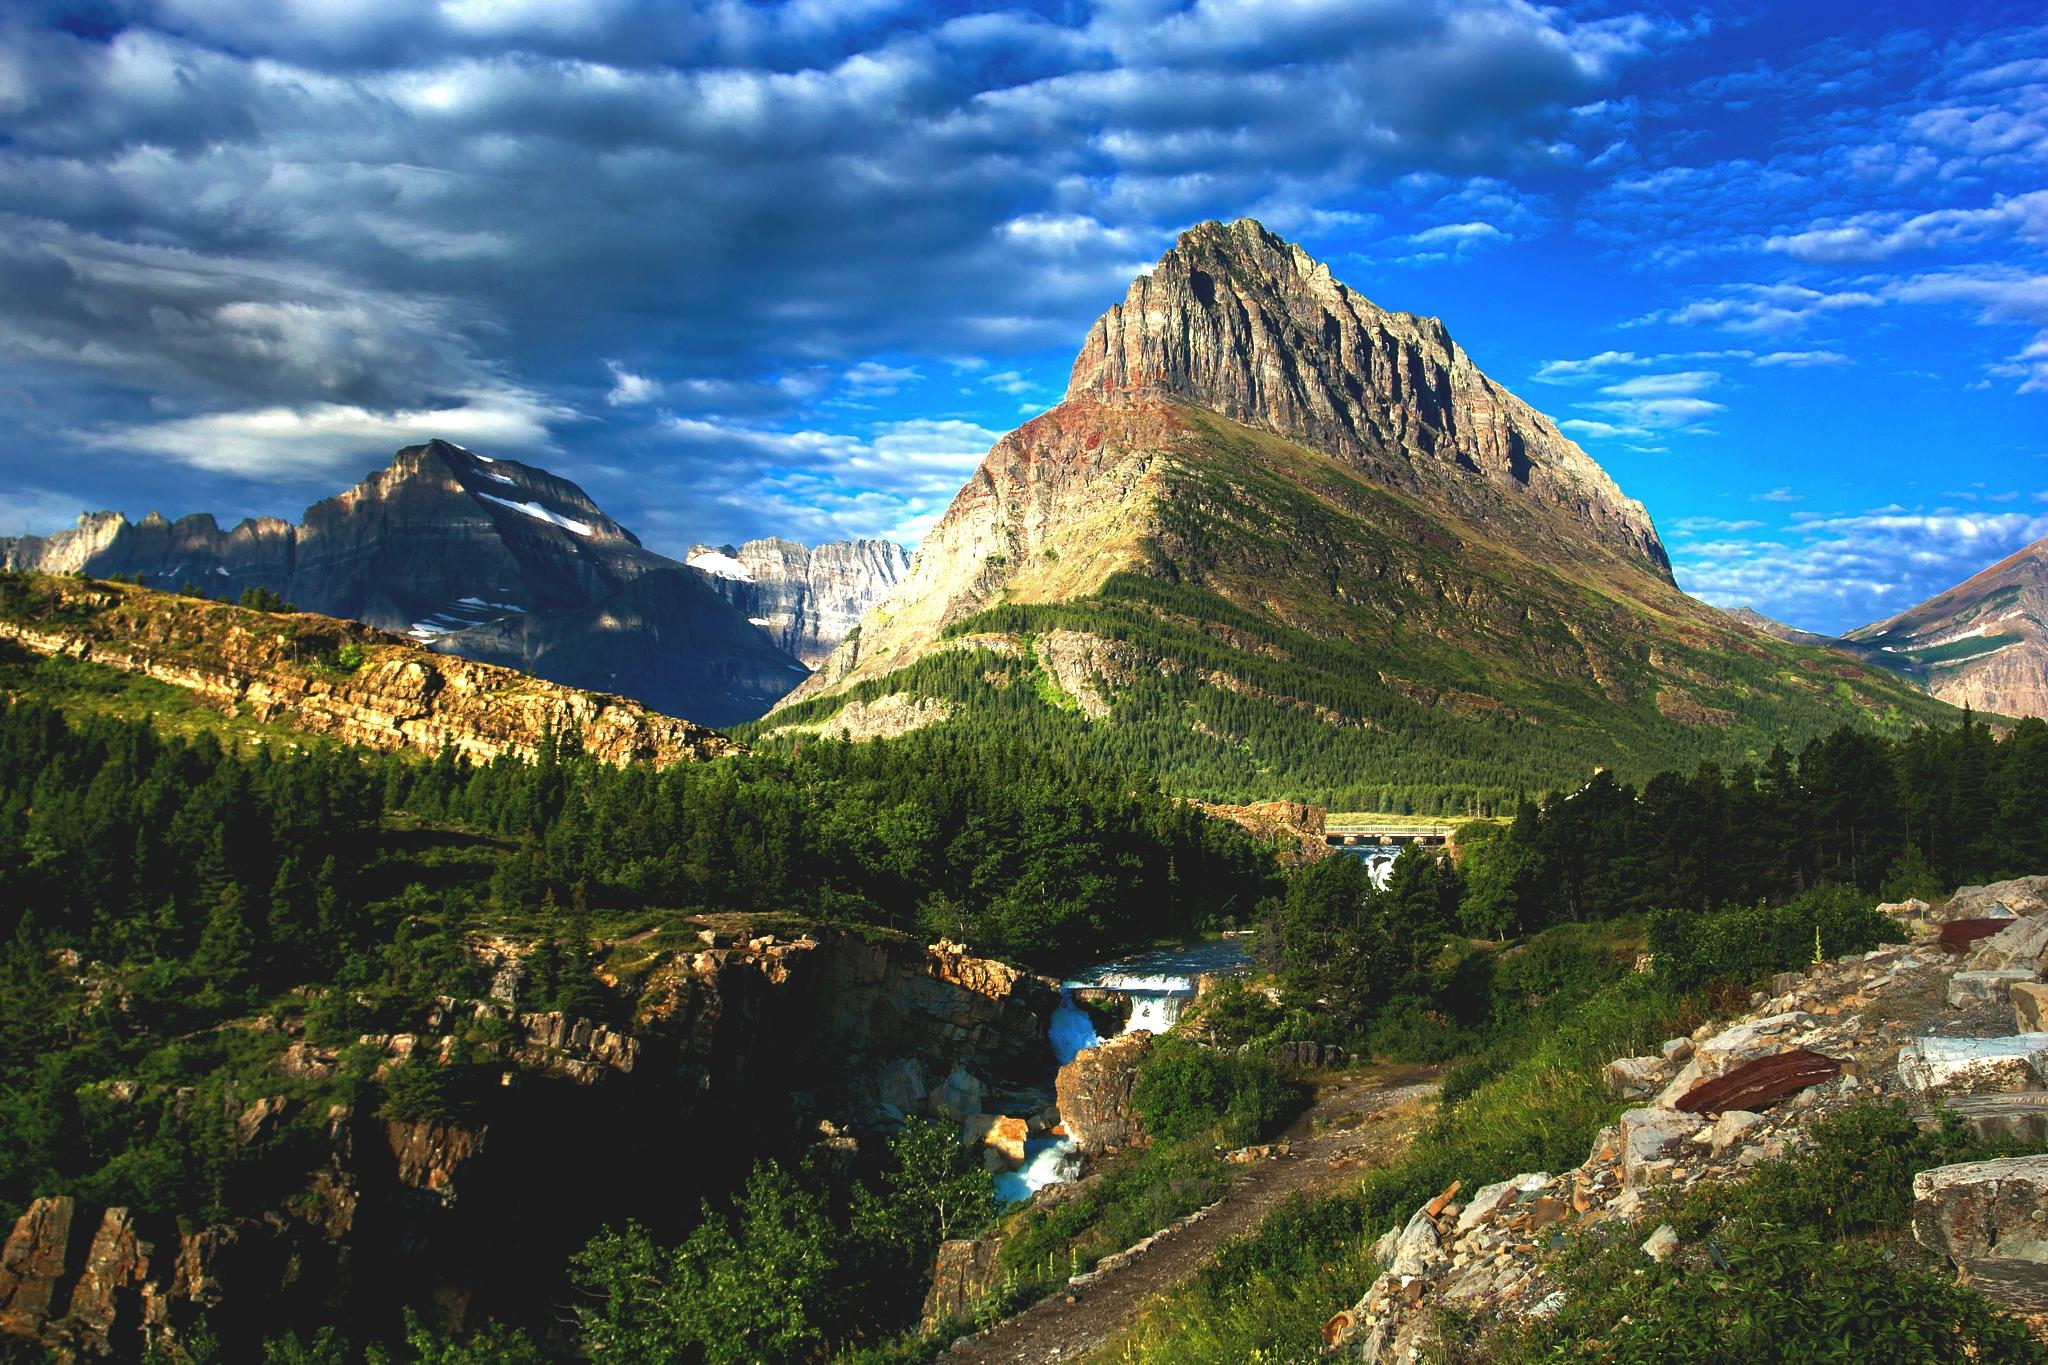 Glacier National Park Desktop Wallpapers   HD Wallpapers Backgrounds 2048x1365